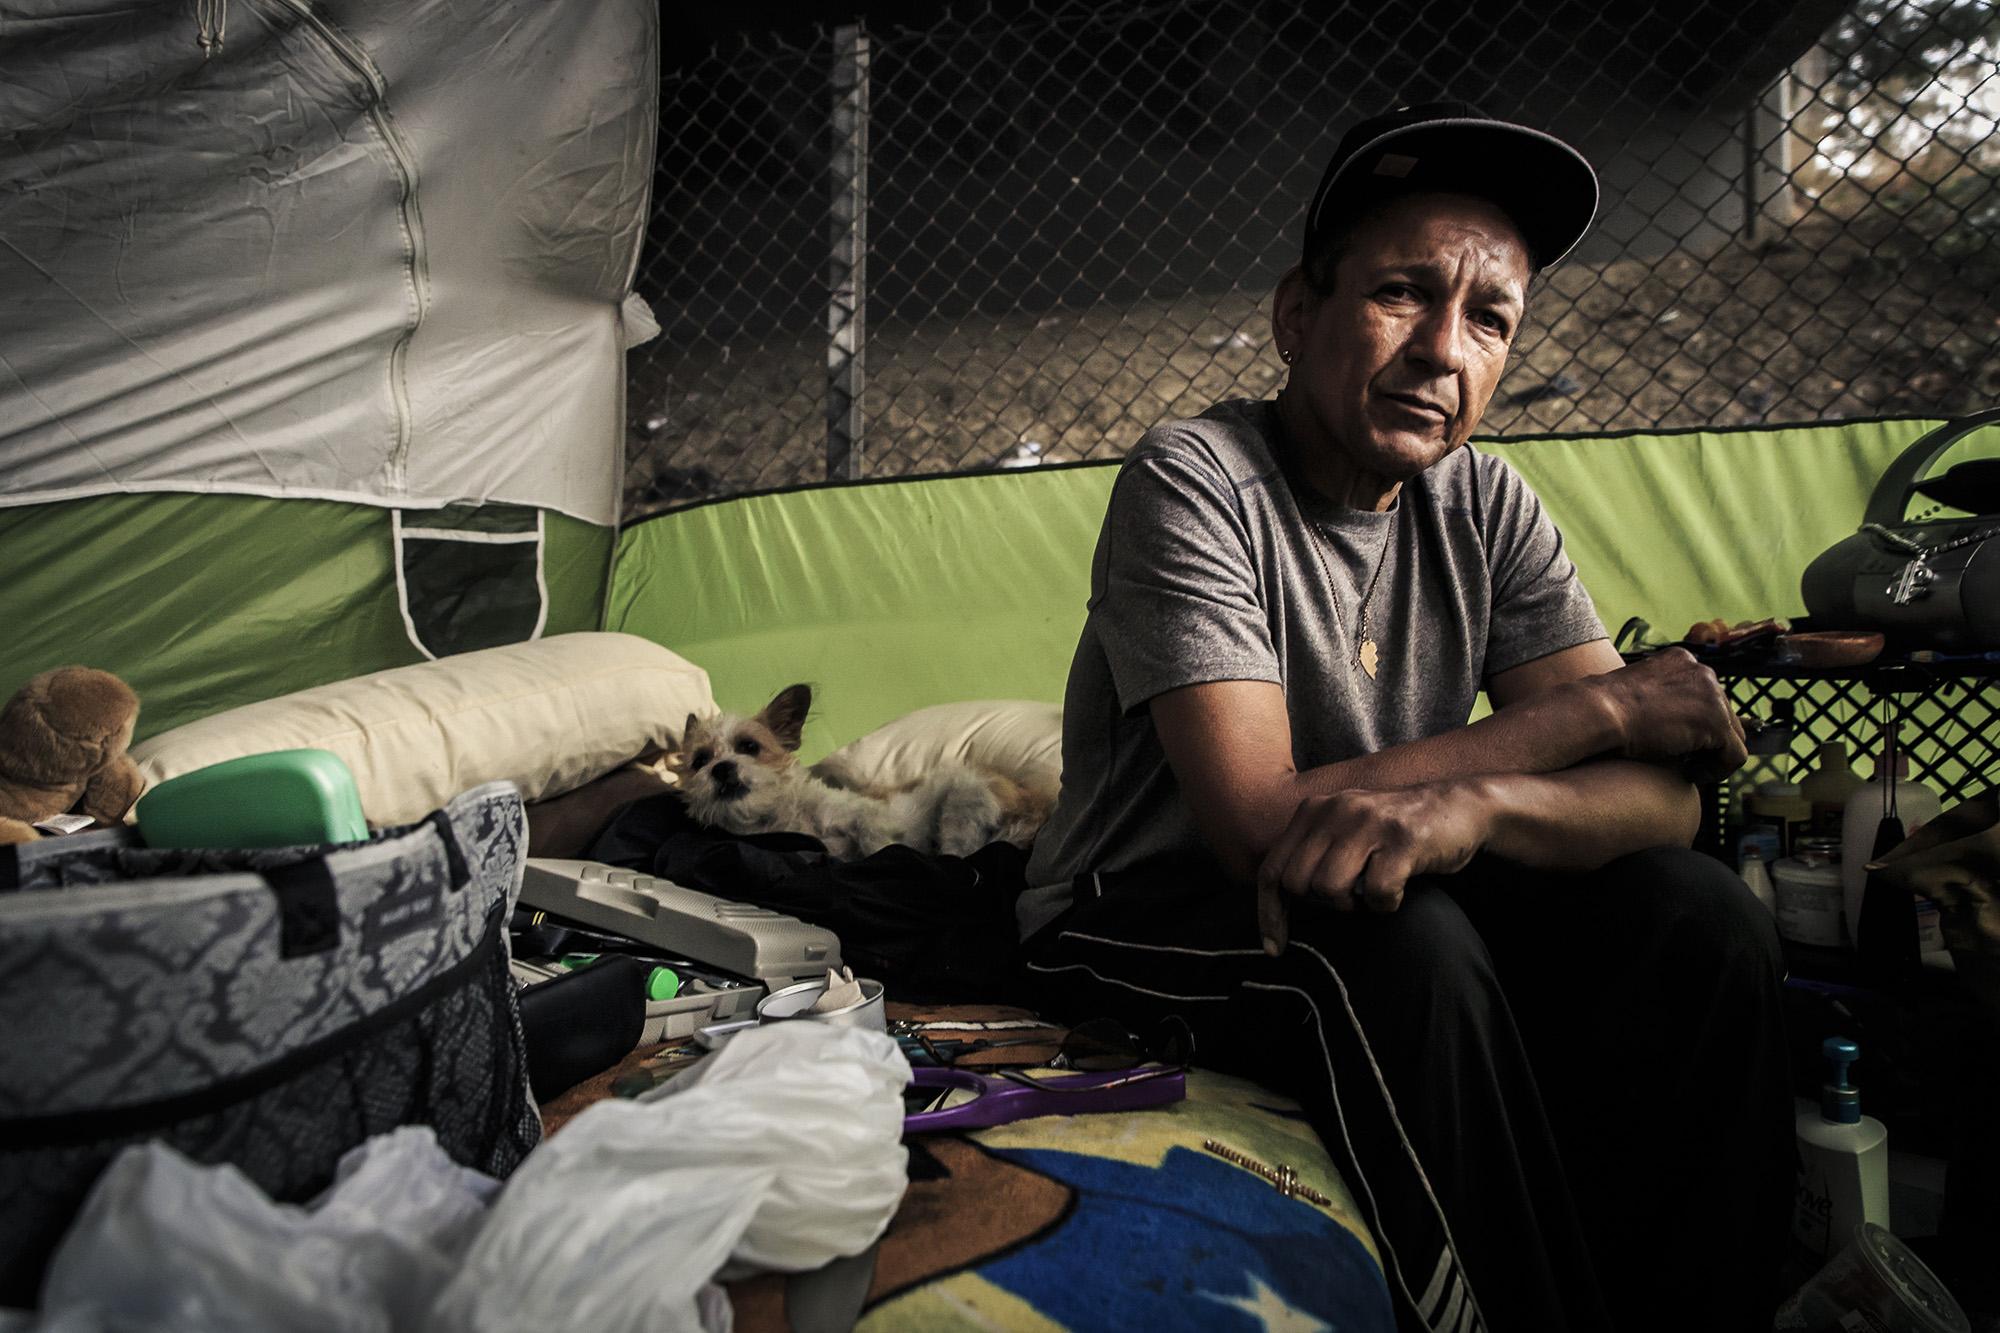 criminalization of poverty in capitalist america essay